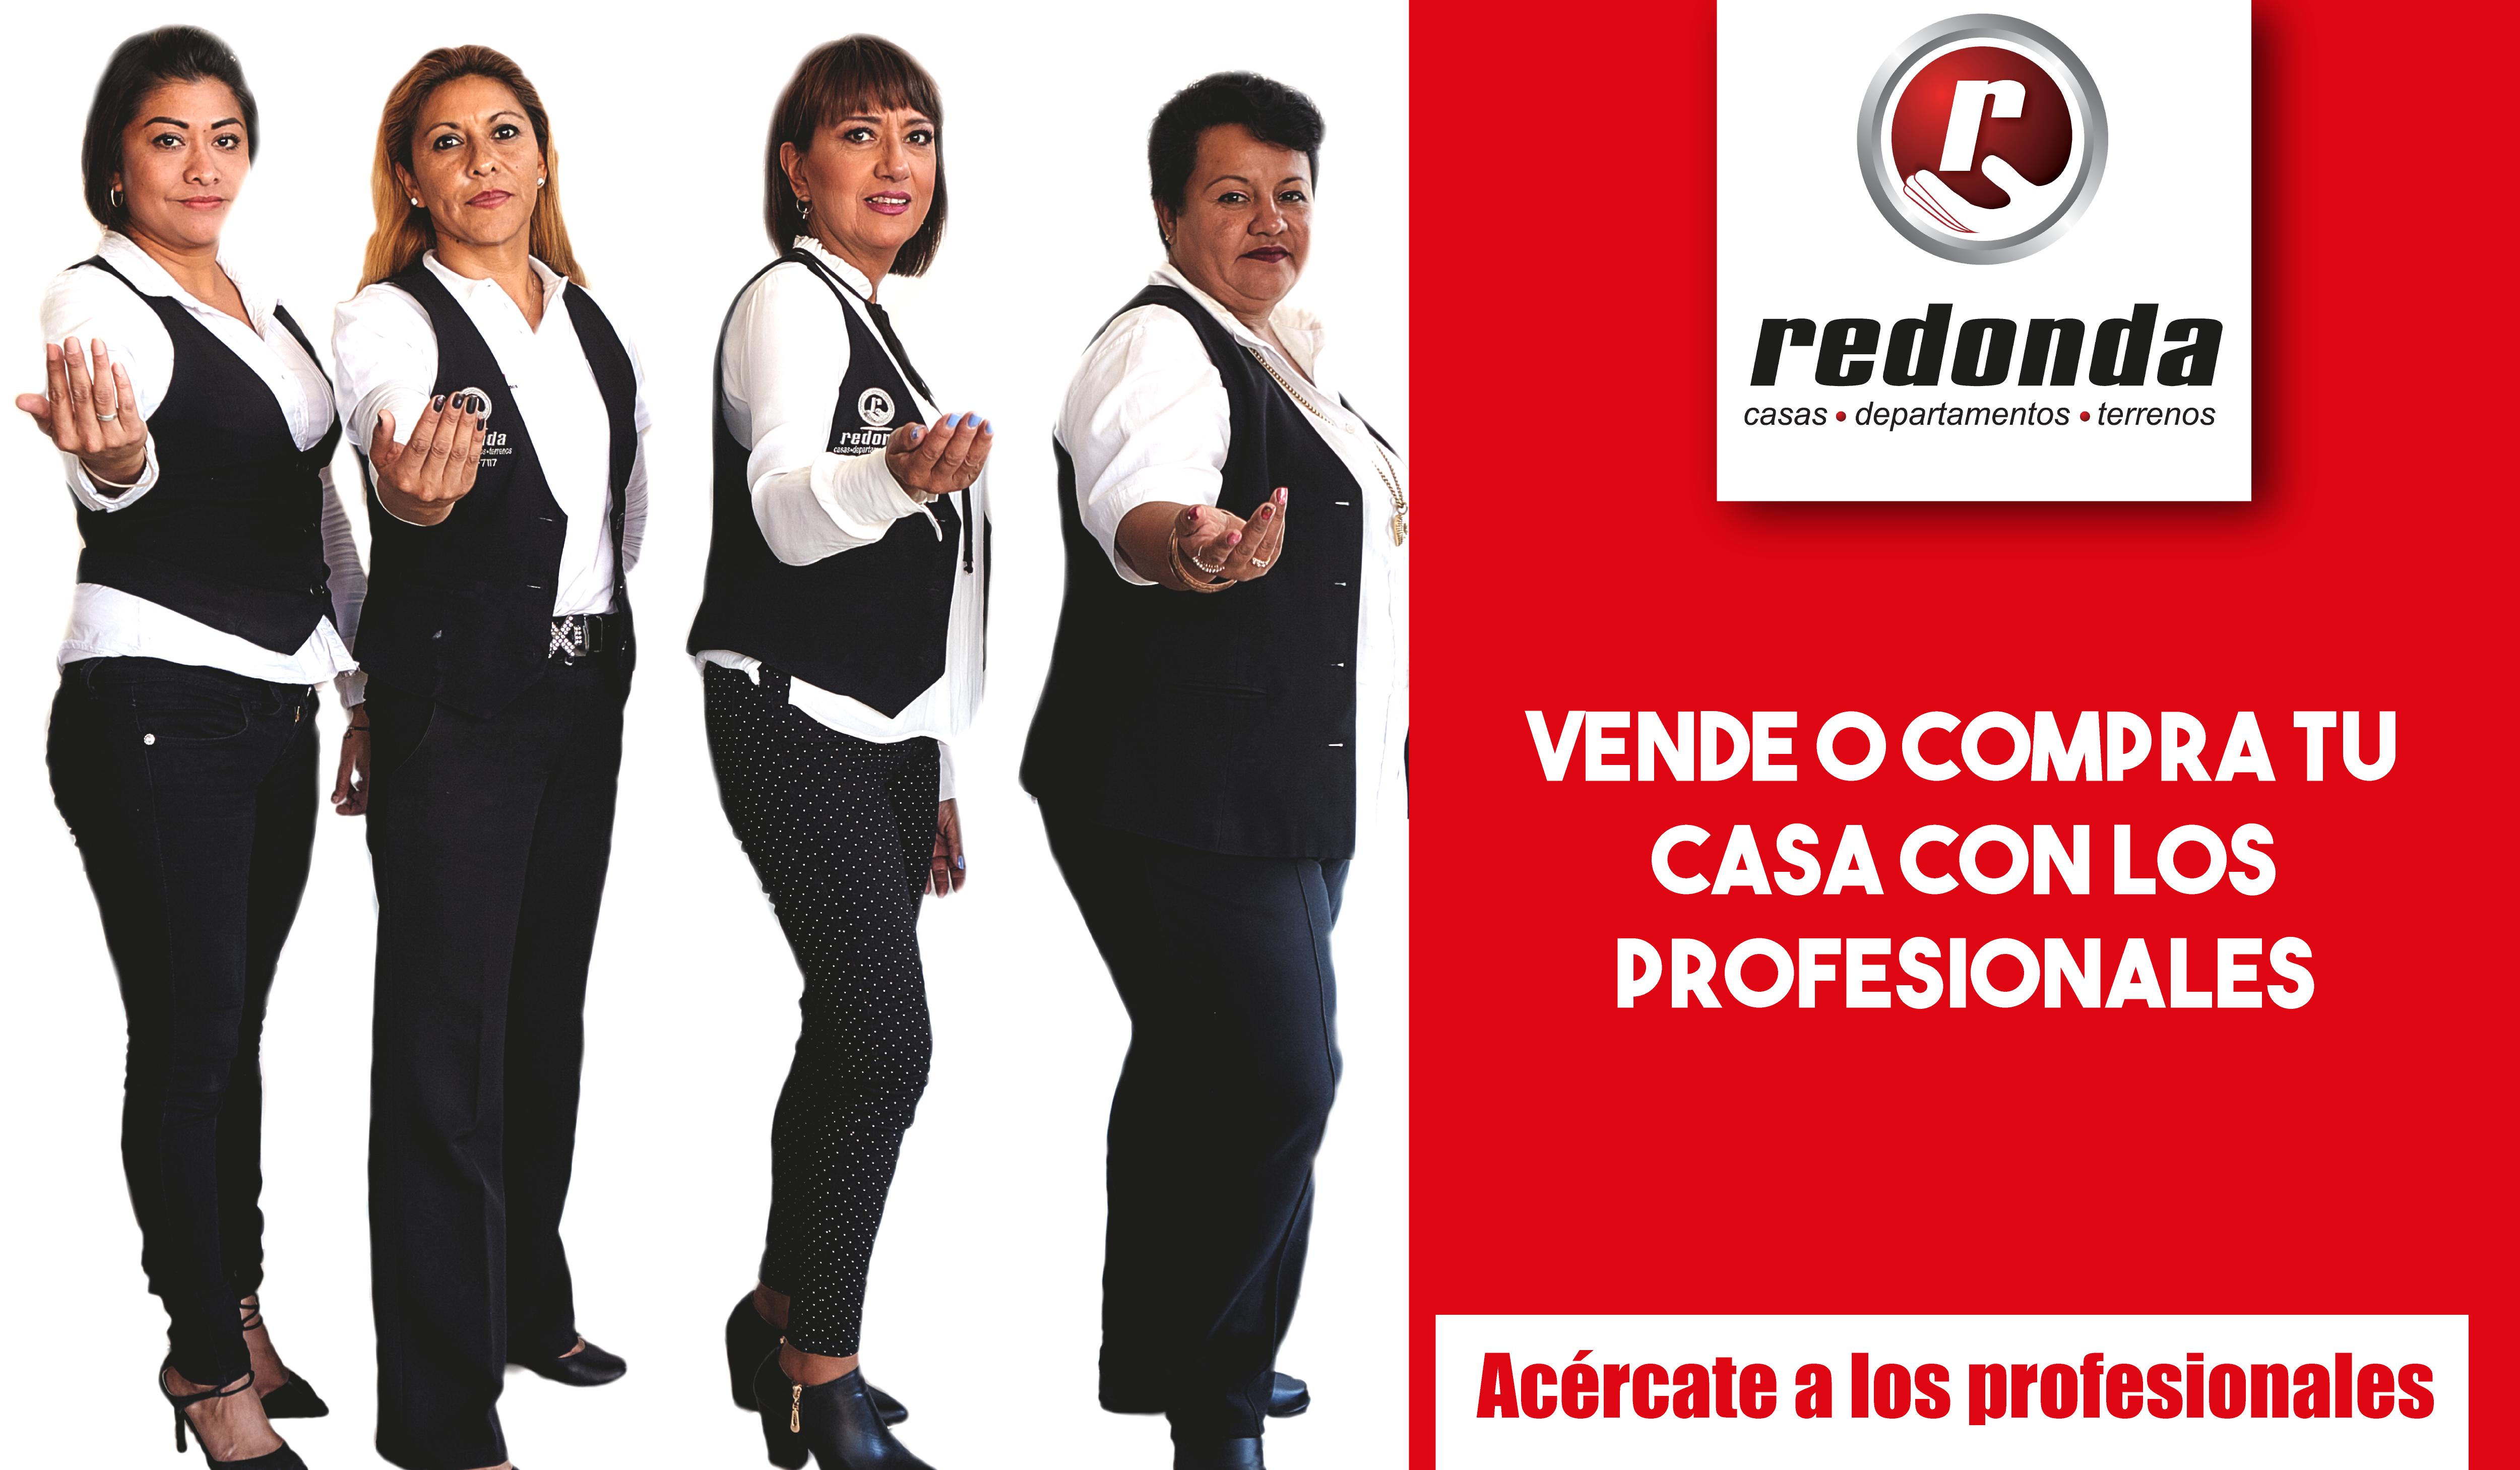 Artes_Redonda-04.png